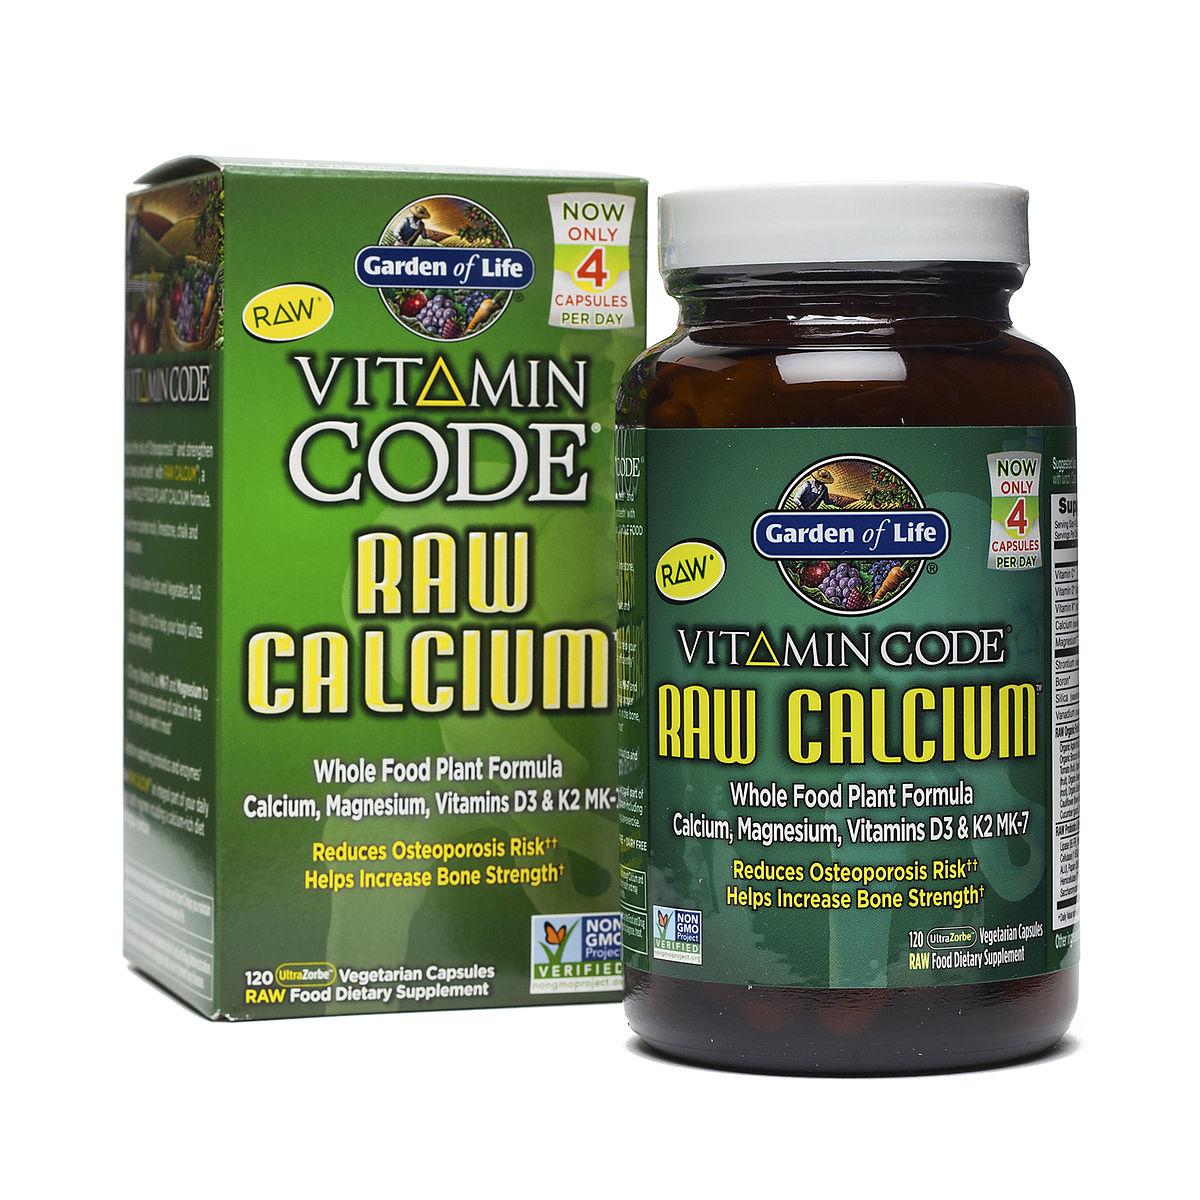 Raw supplements